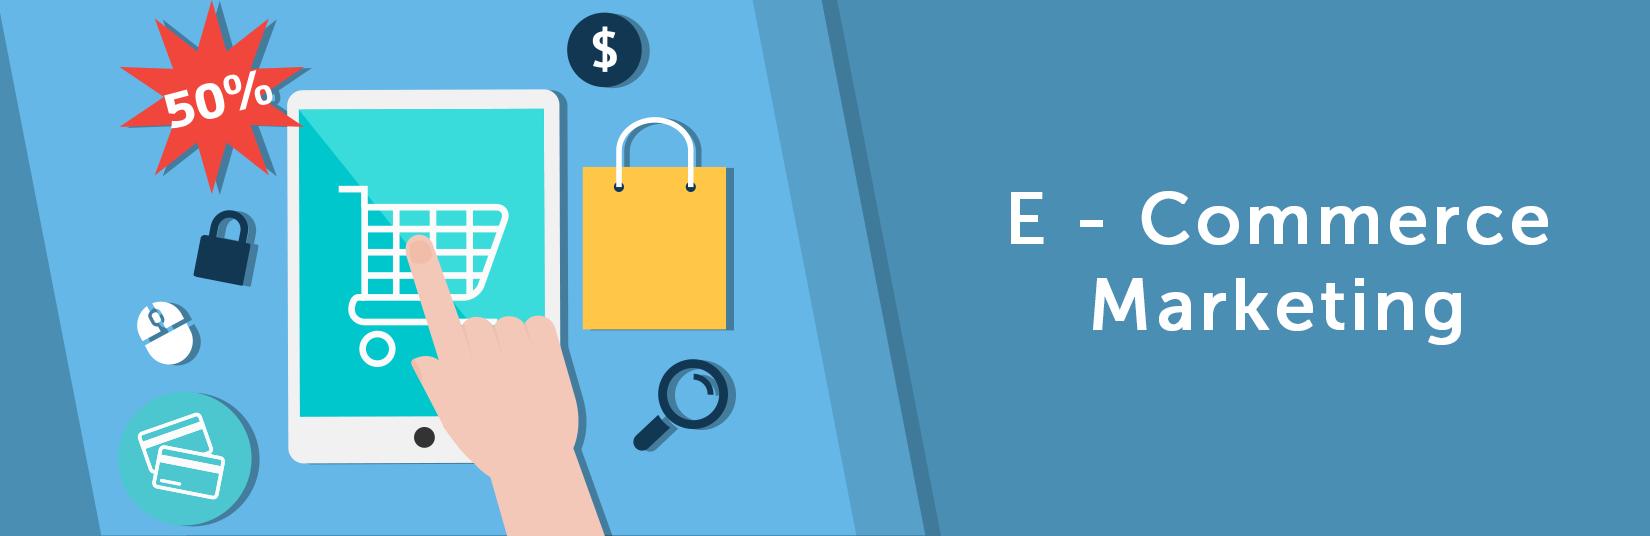 E-commerce-Marketing-multichanne